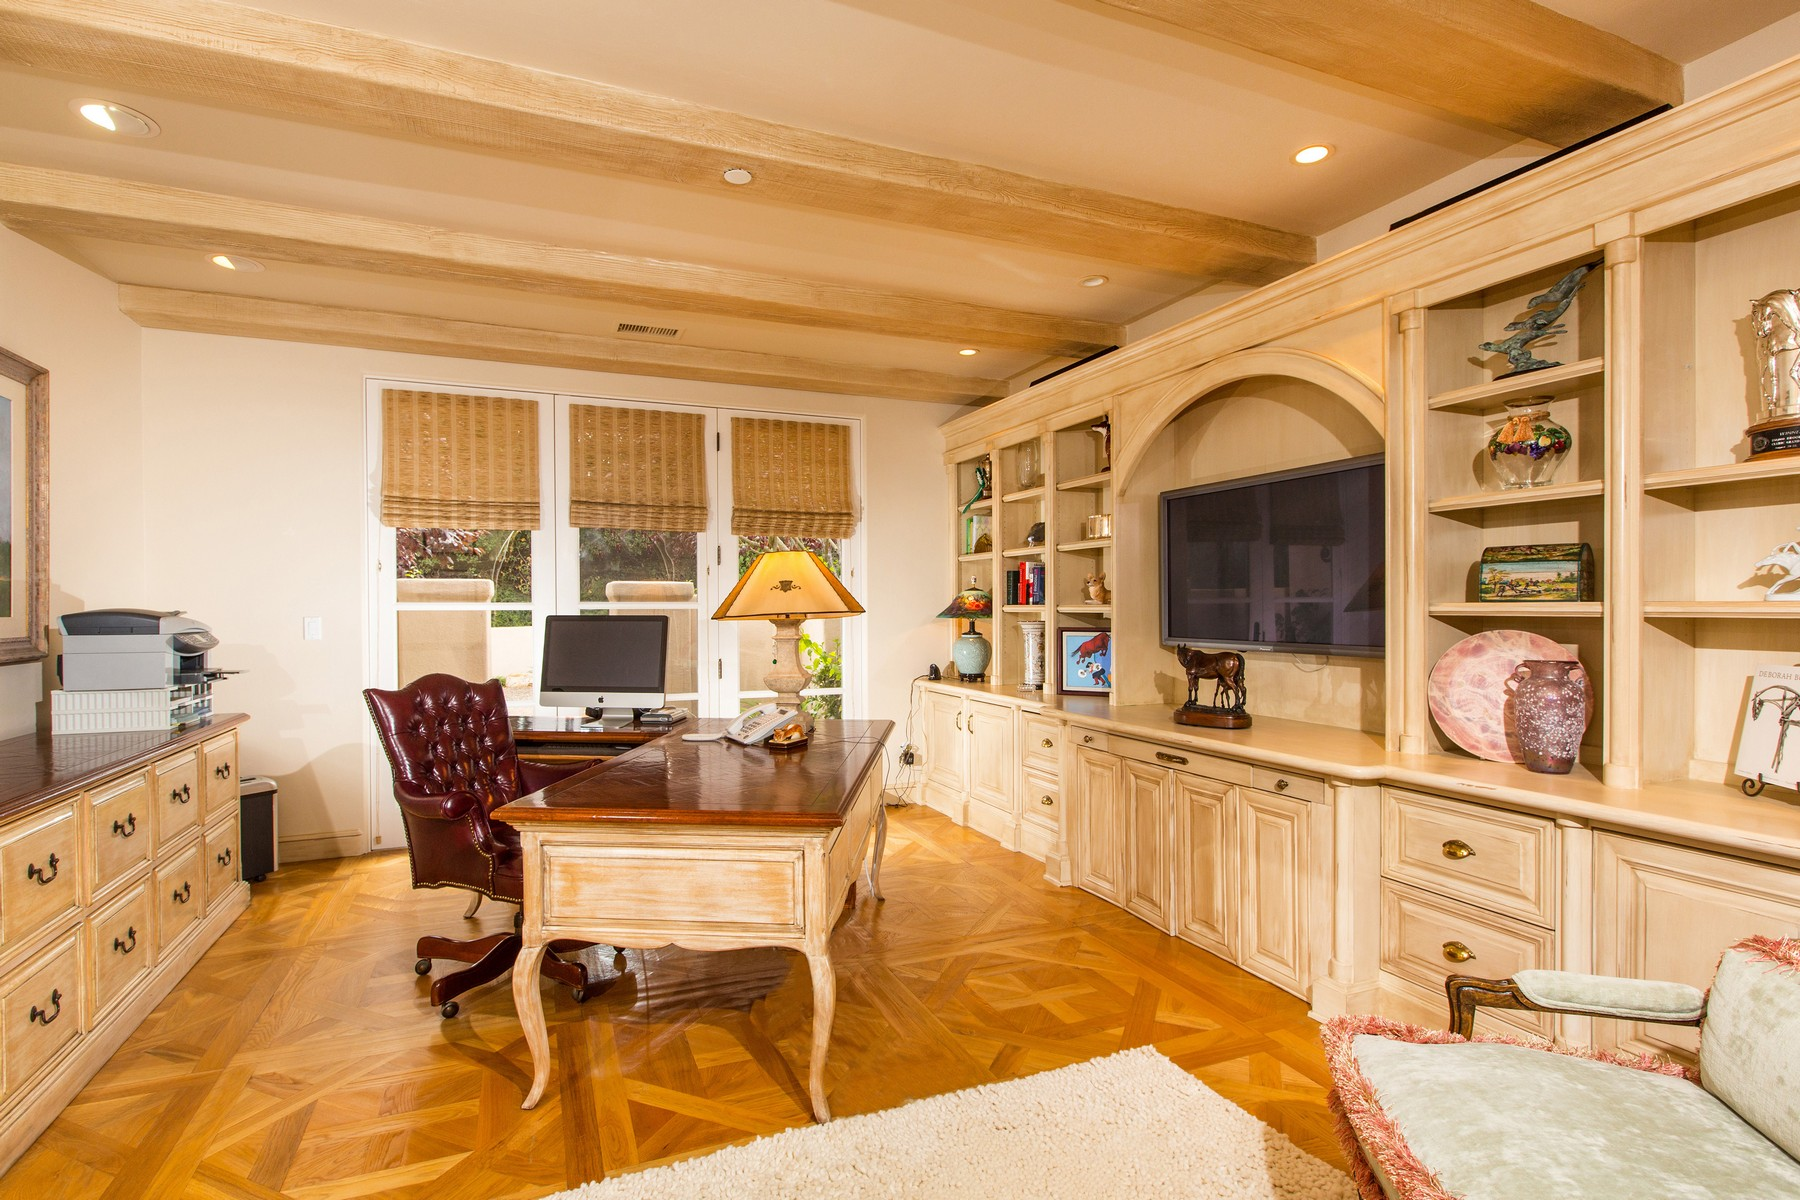 Additional photo for property listing at San Elijo 5546 San Elijo Rancho Santa Fe, California 92067 United States